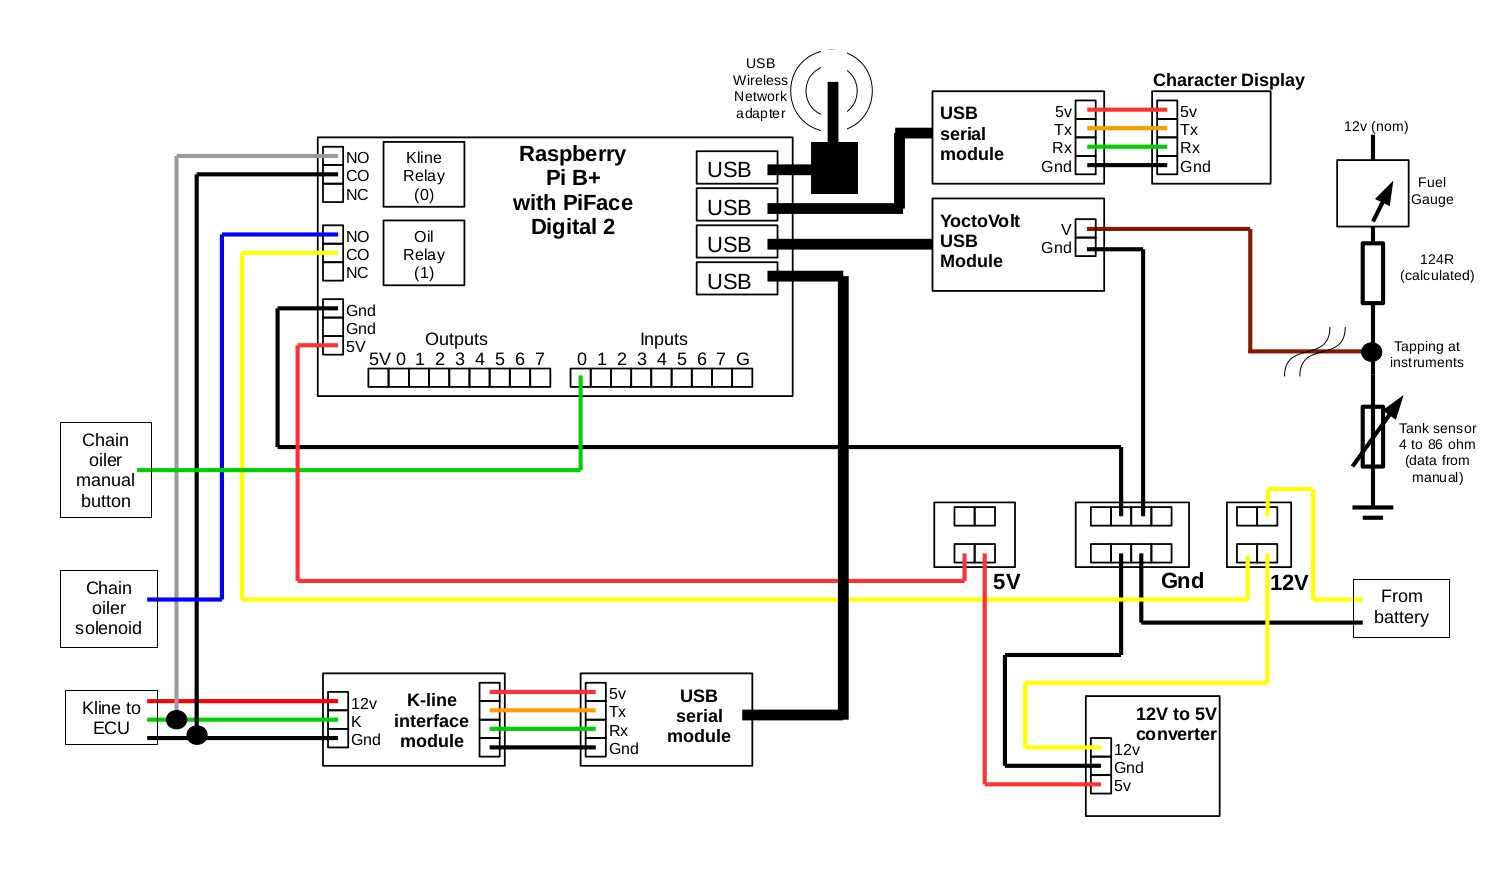 Obd Socket Wiring Diagram Wire Data Schema P75 Obd2 Schematic Block And Diagrams U2022 Rh Lazysupply Co 1771